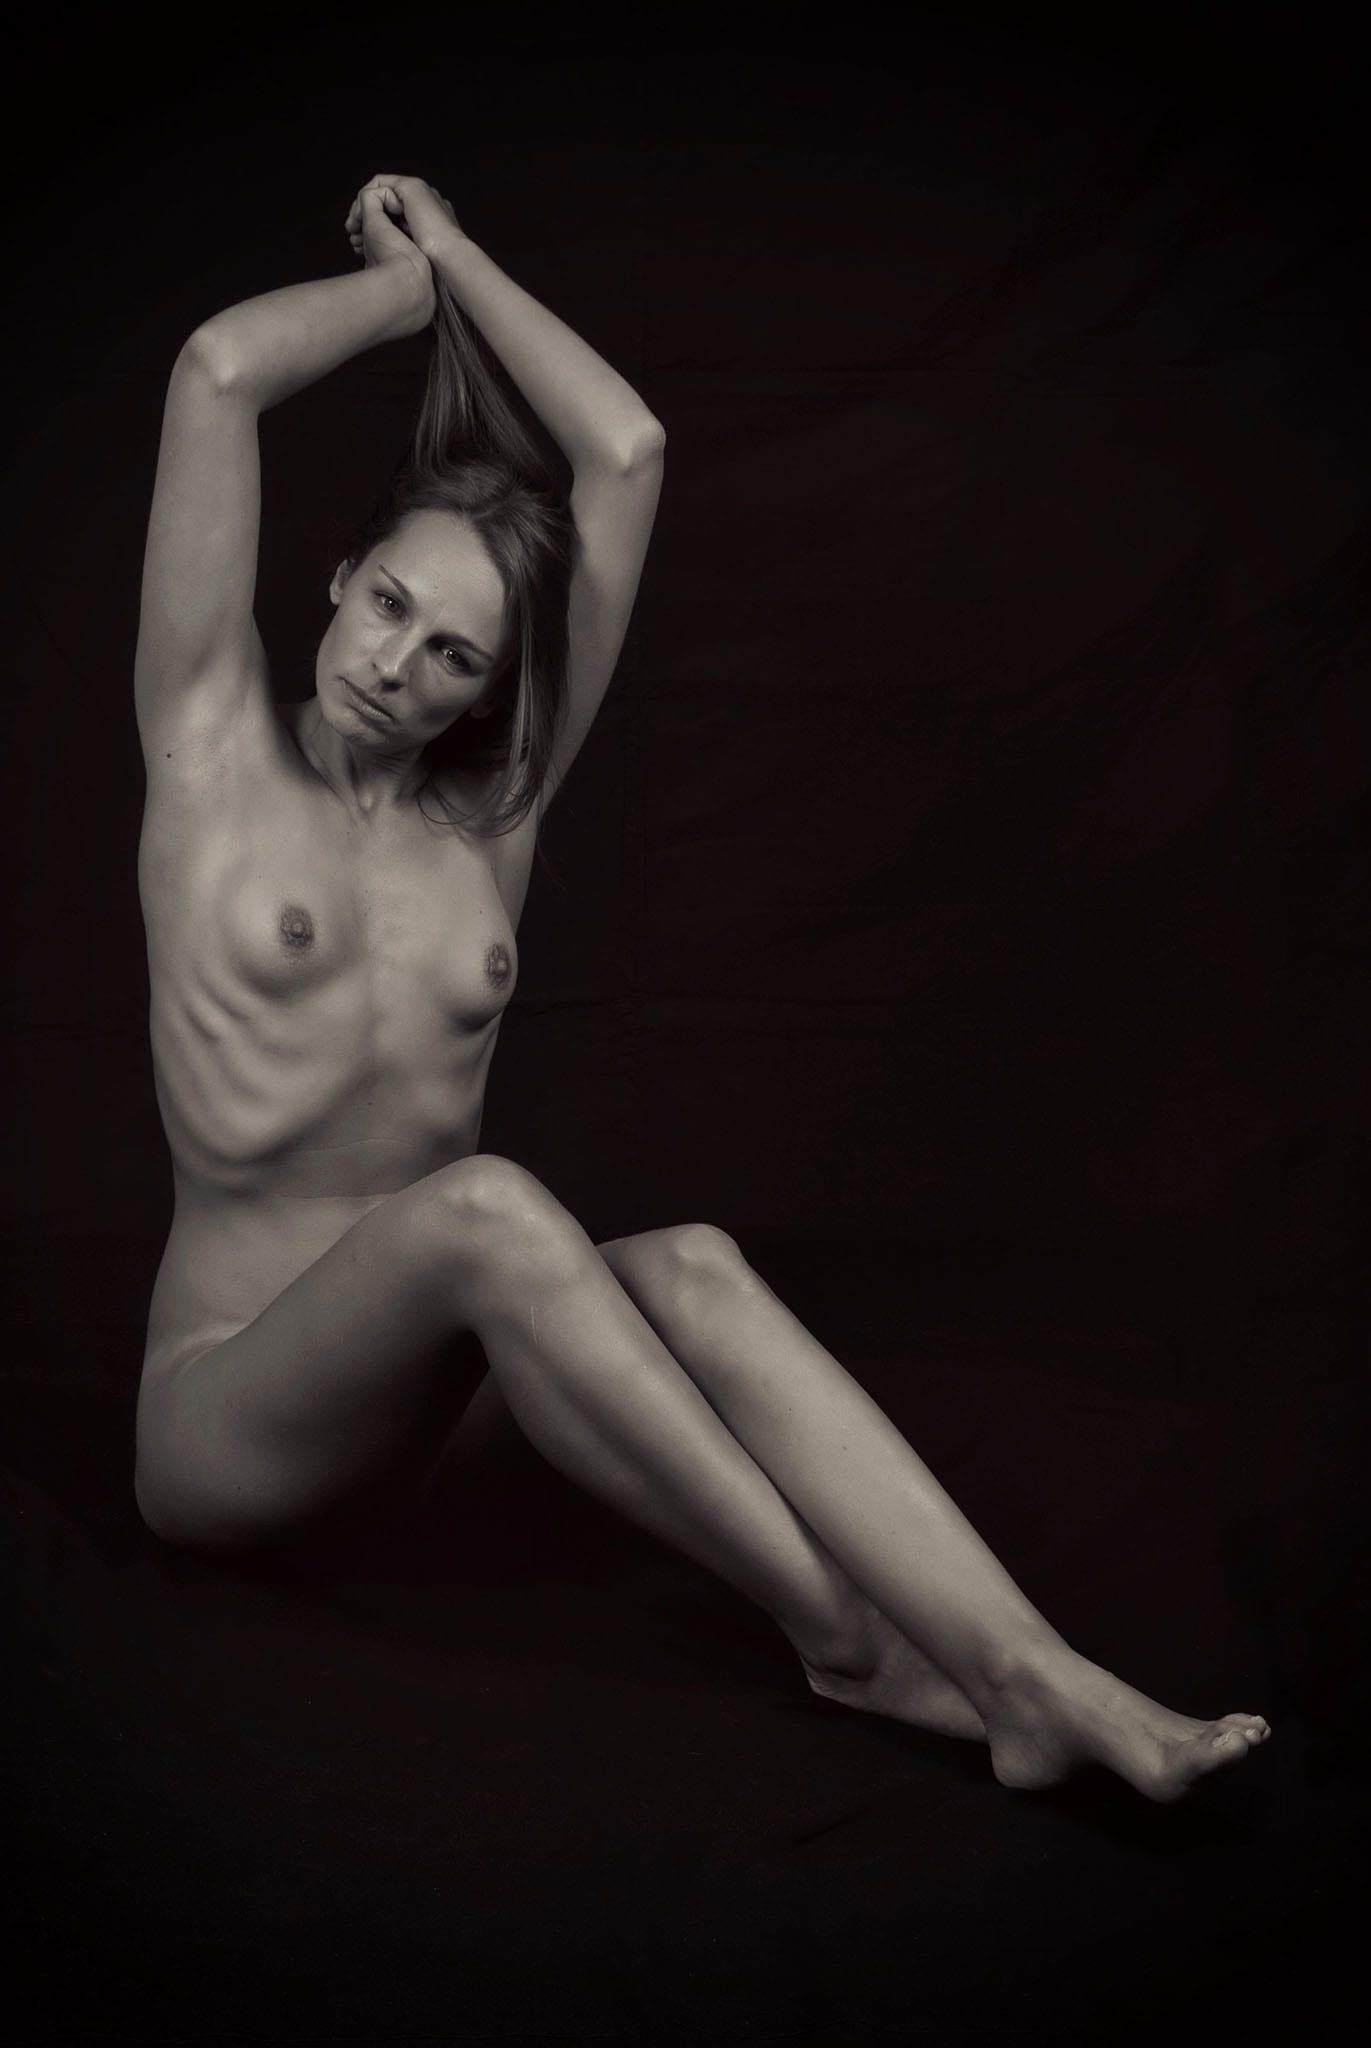 Akt 05 - Akt Nude Act Aktfotografie Erotik Erotic